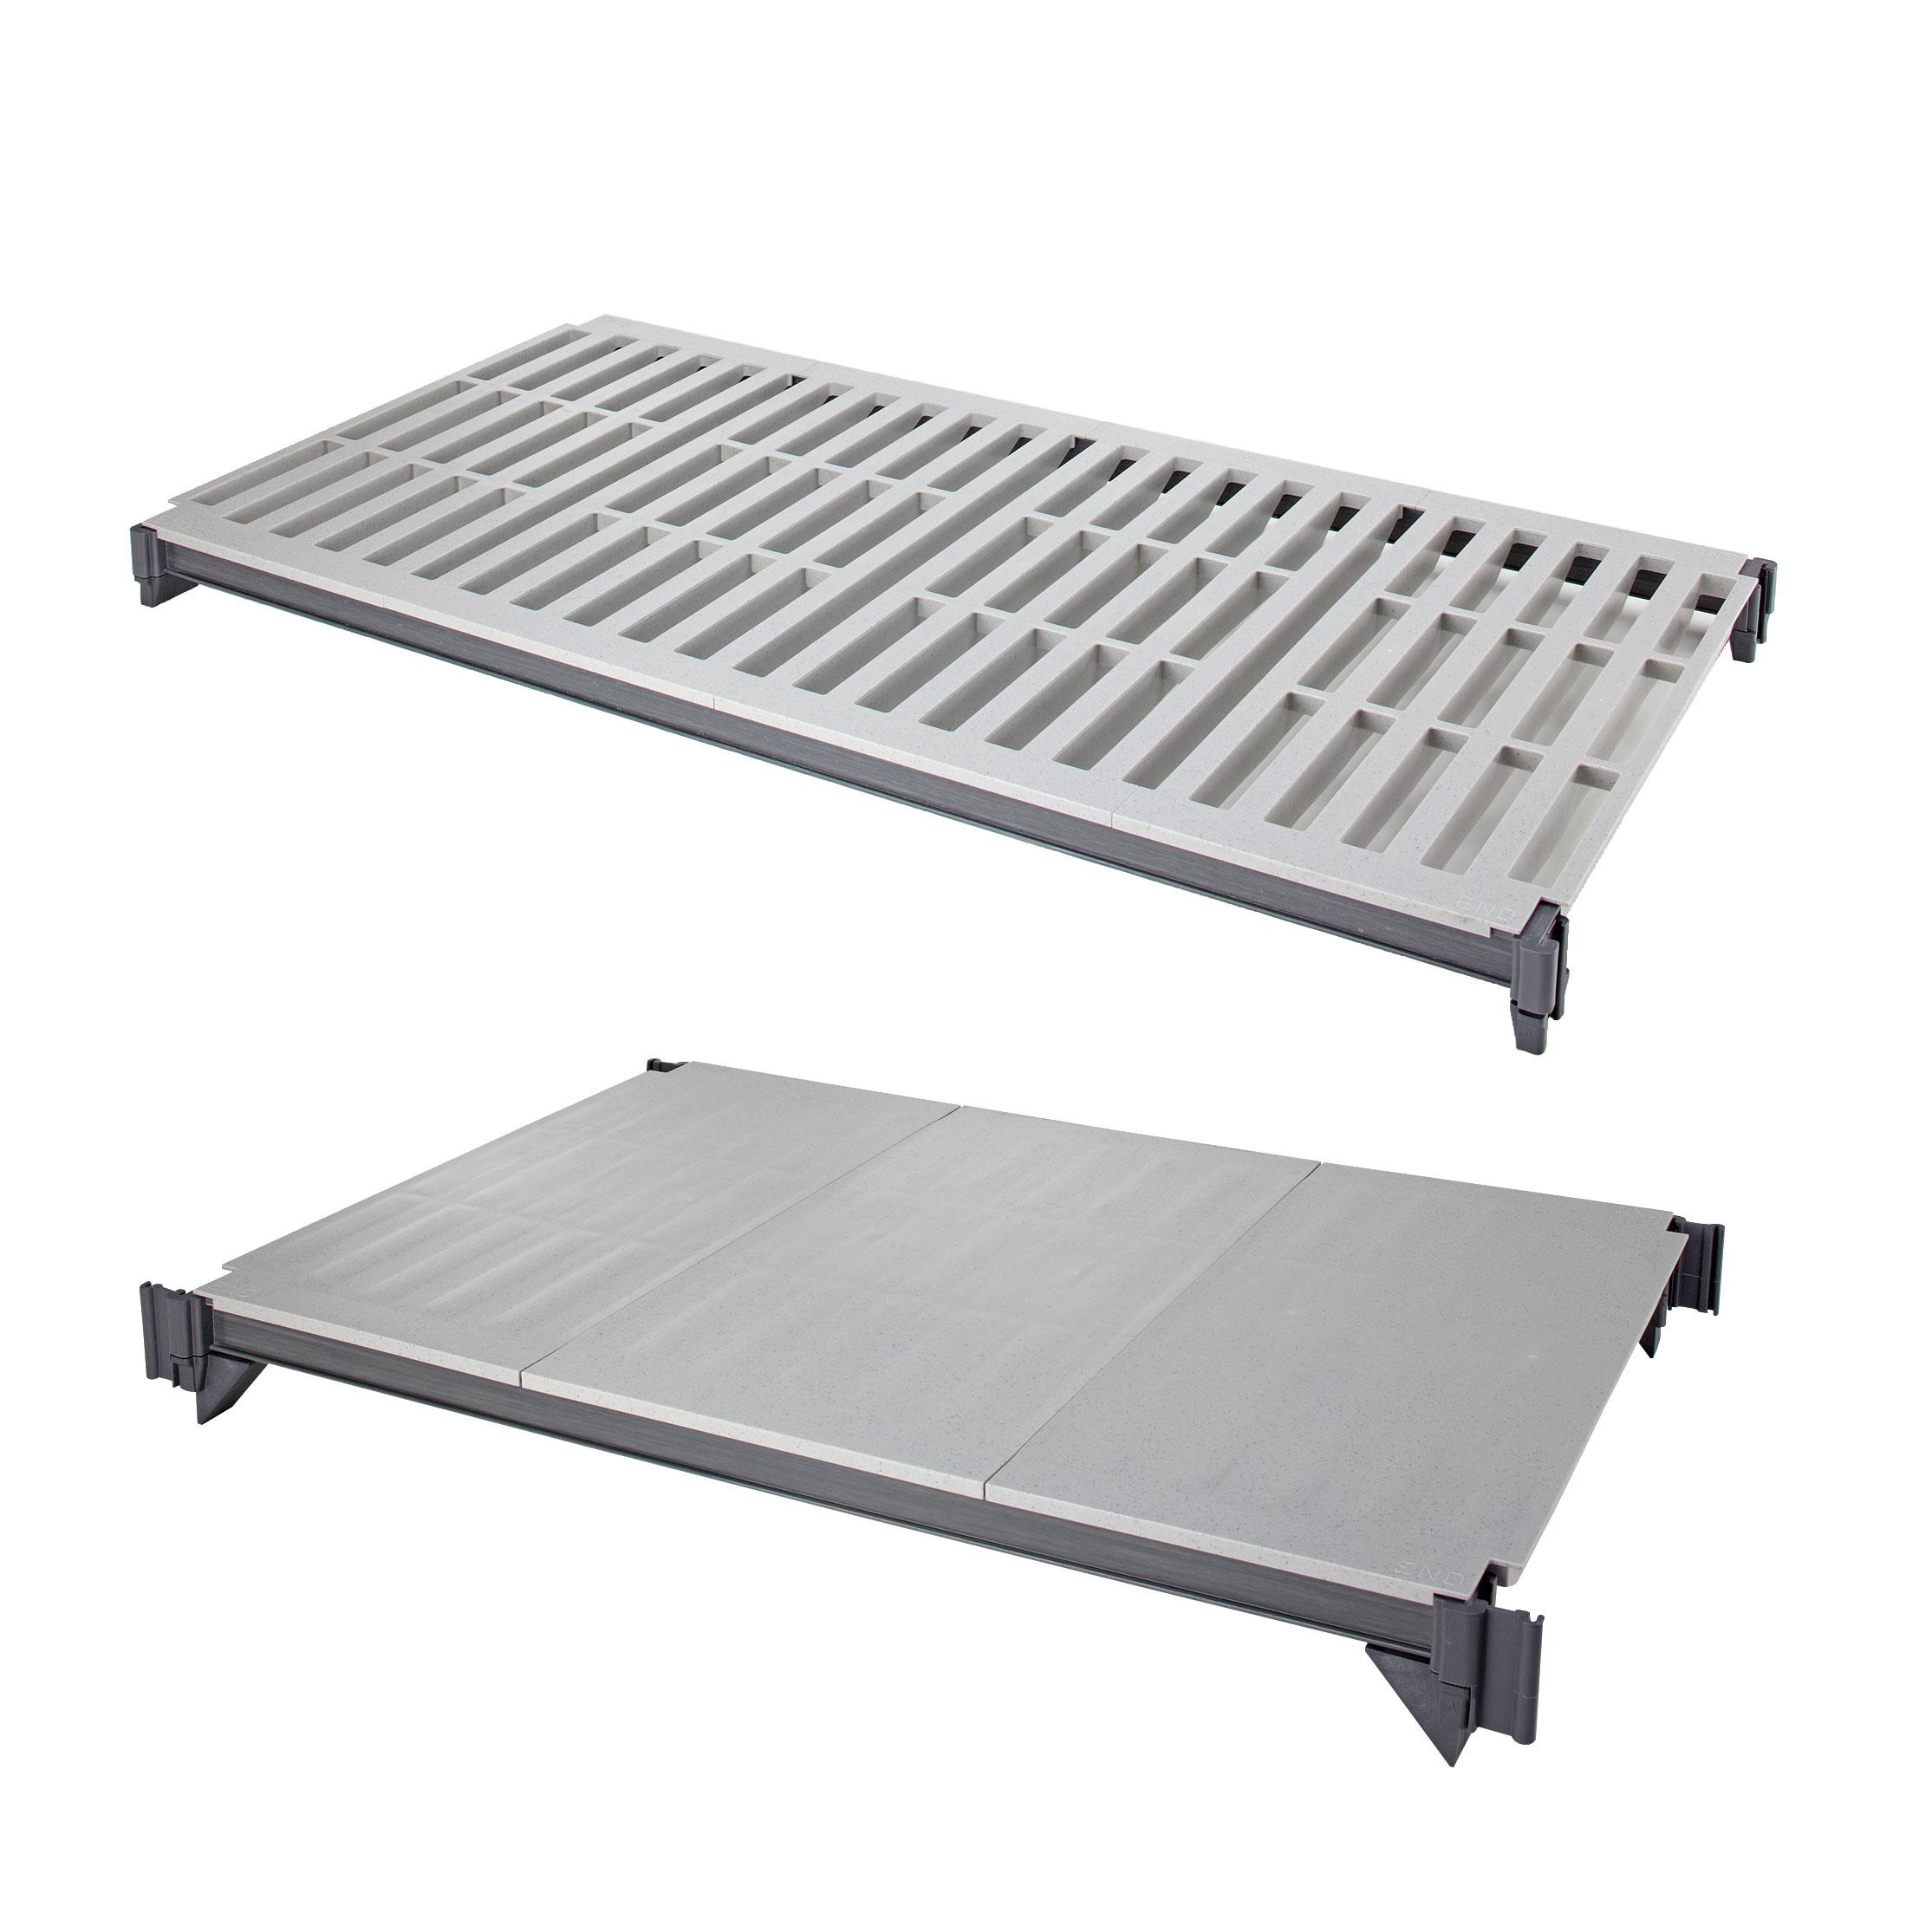 Cambro ESK2148VS5580 shelving/shelving systems